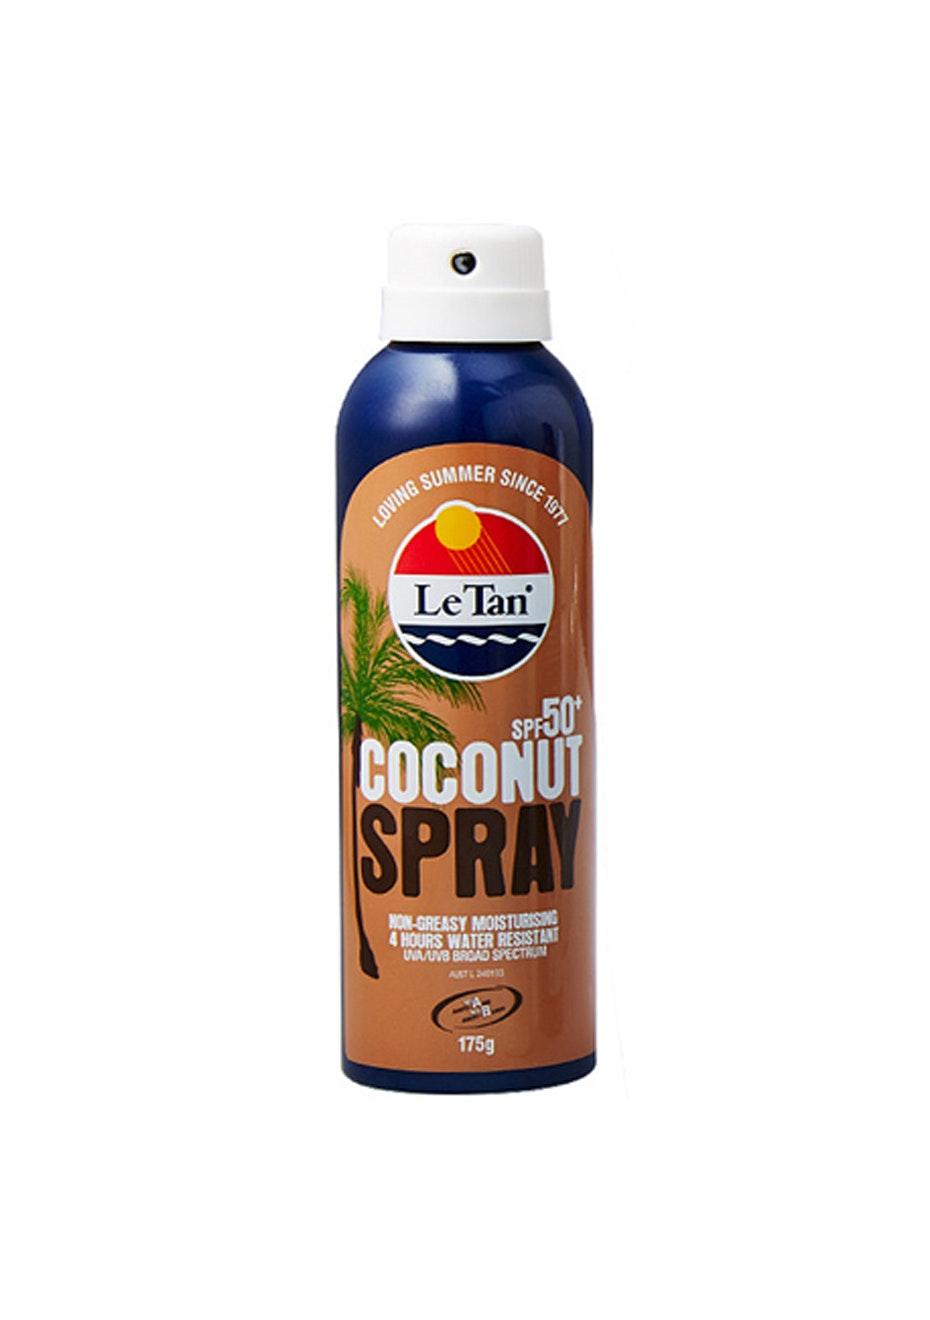 Le Tan Coconut Aerosol Spray SPF 50+